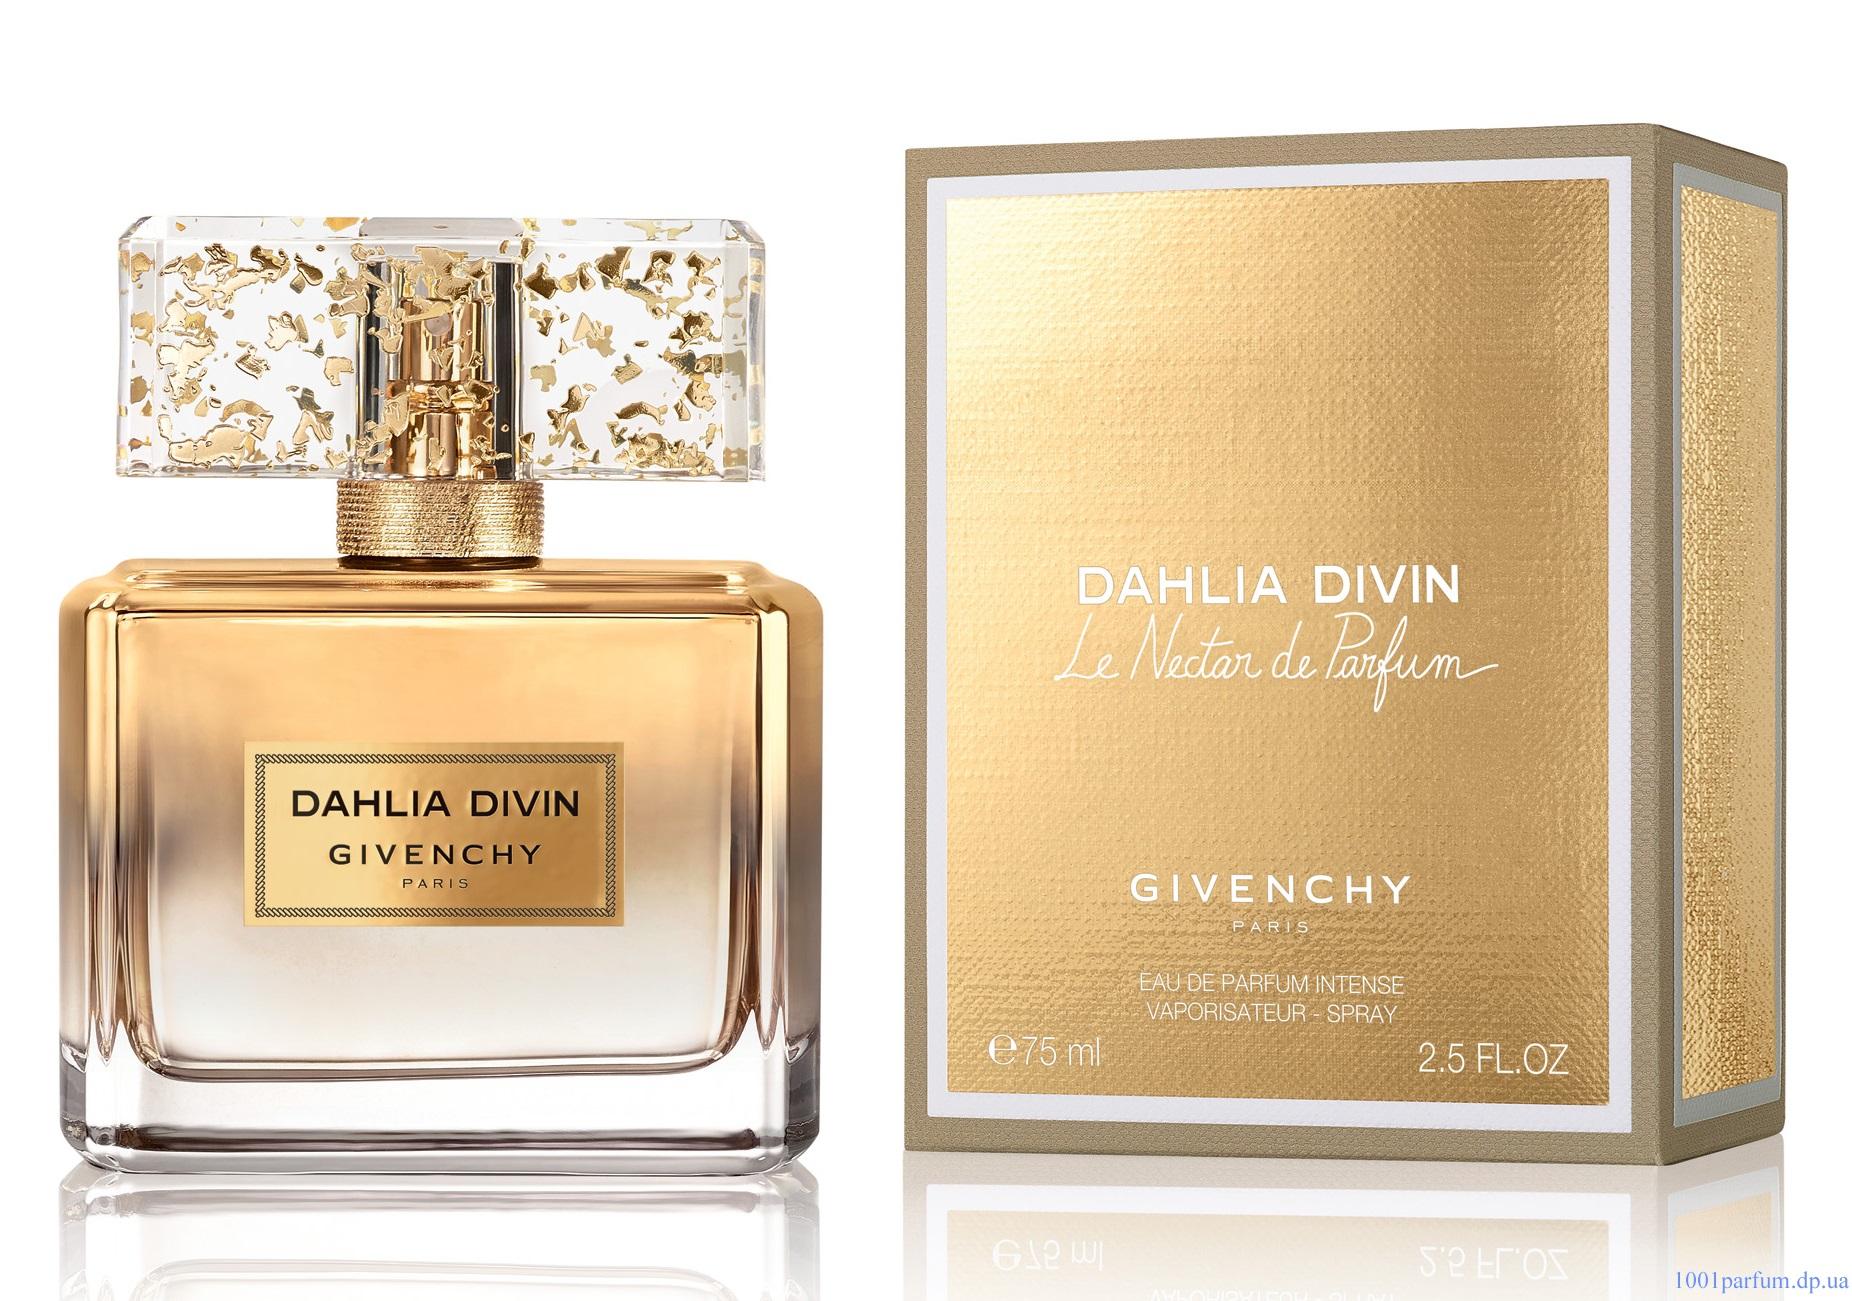 Salon De Jardin C Discount Inspirant Dahlia Divin Le Nectar De Parfum Givenchy Of 40 Inspirant Salon De Jardin C Discount